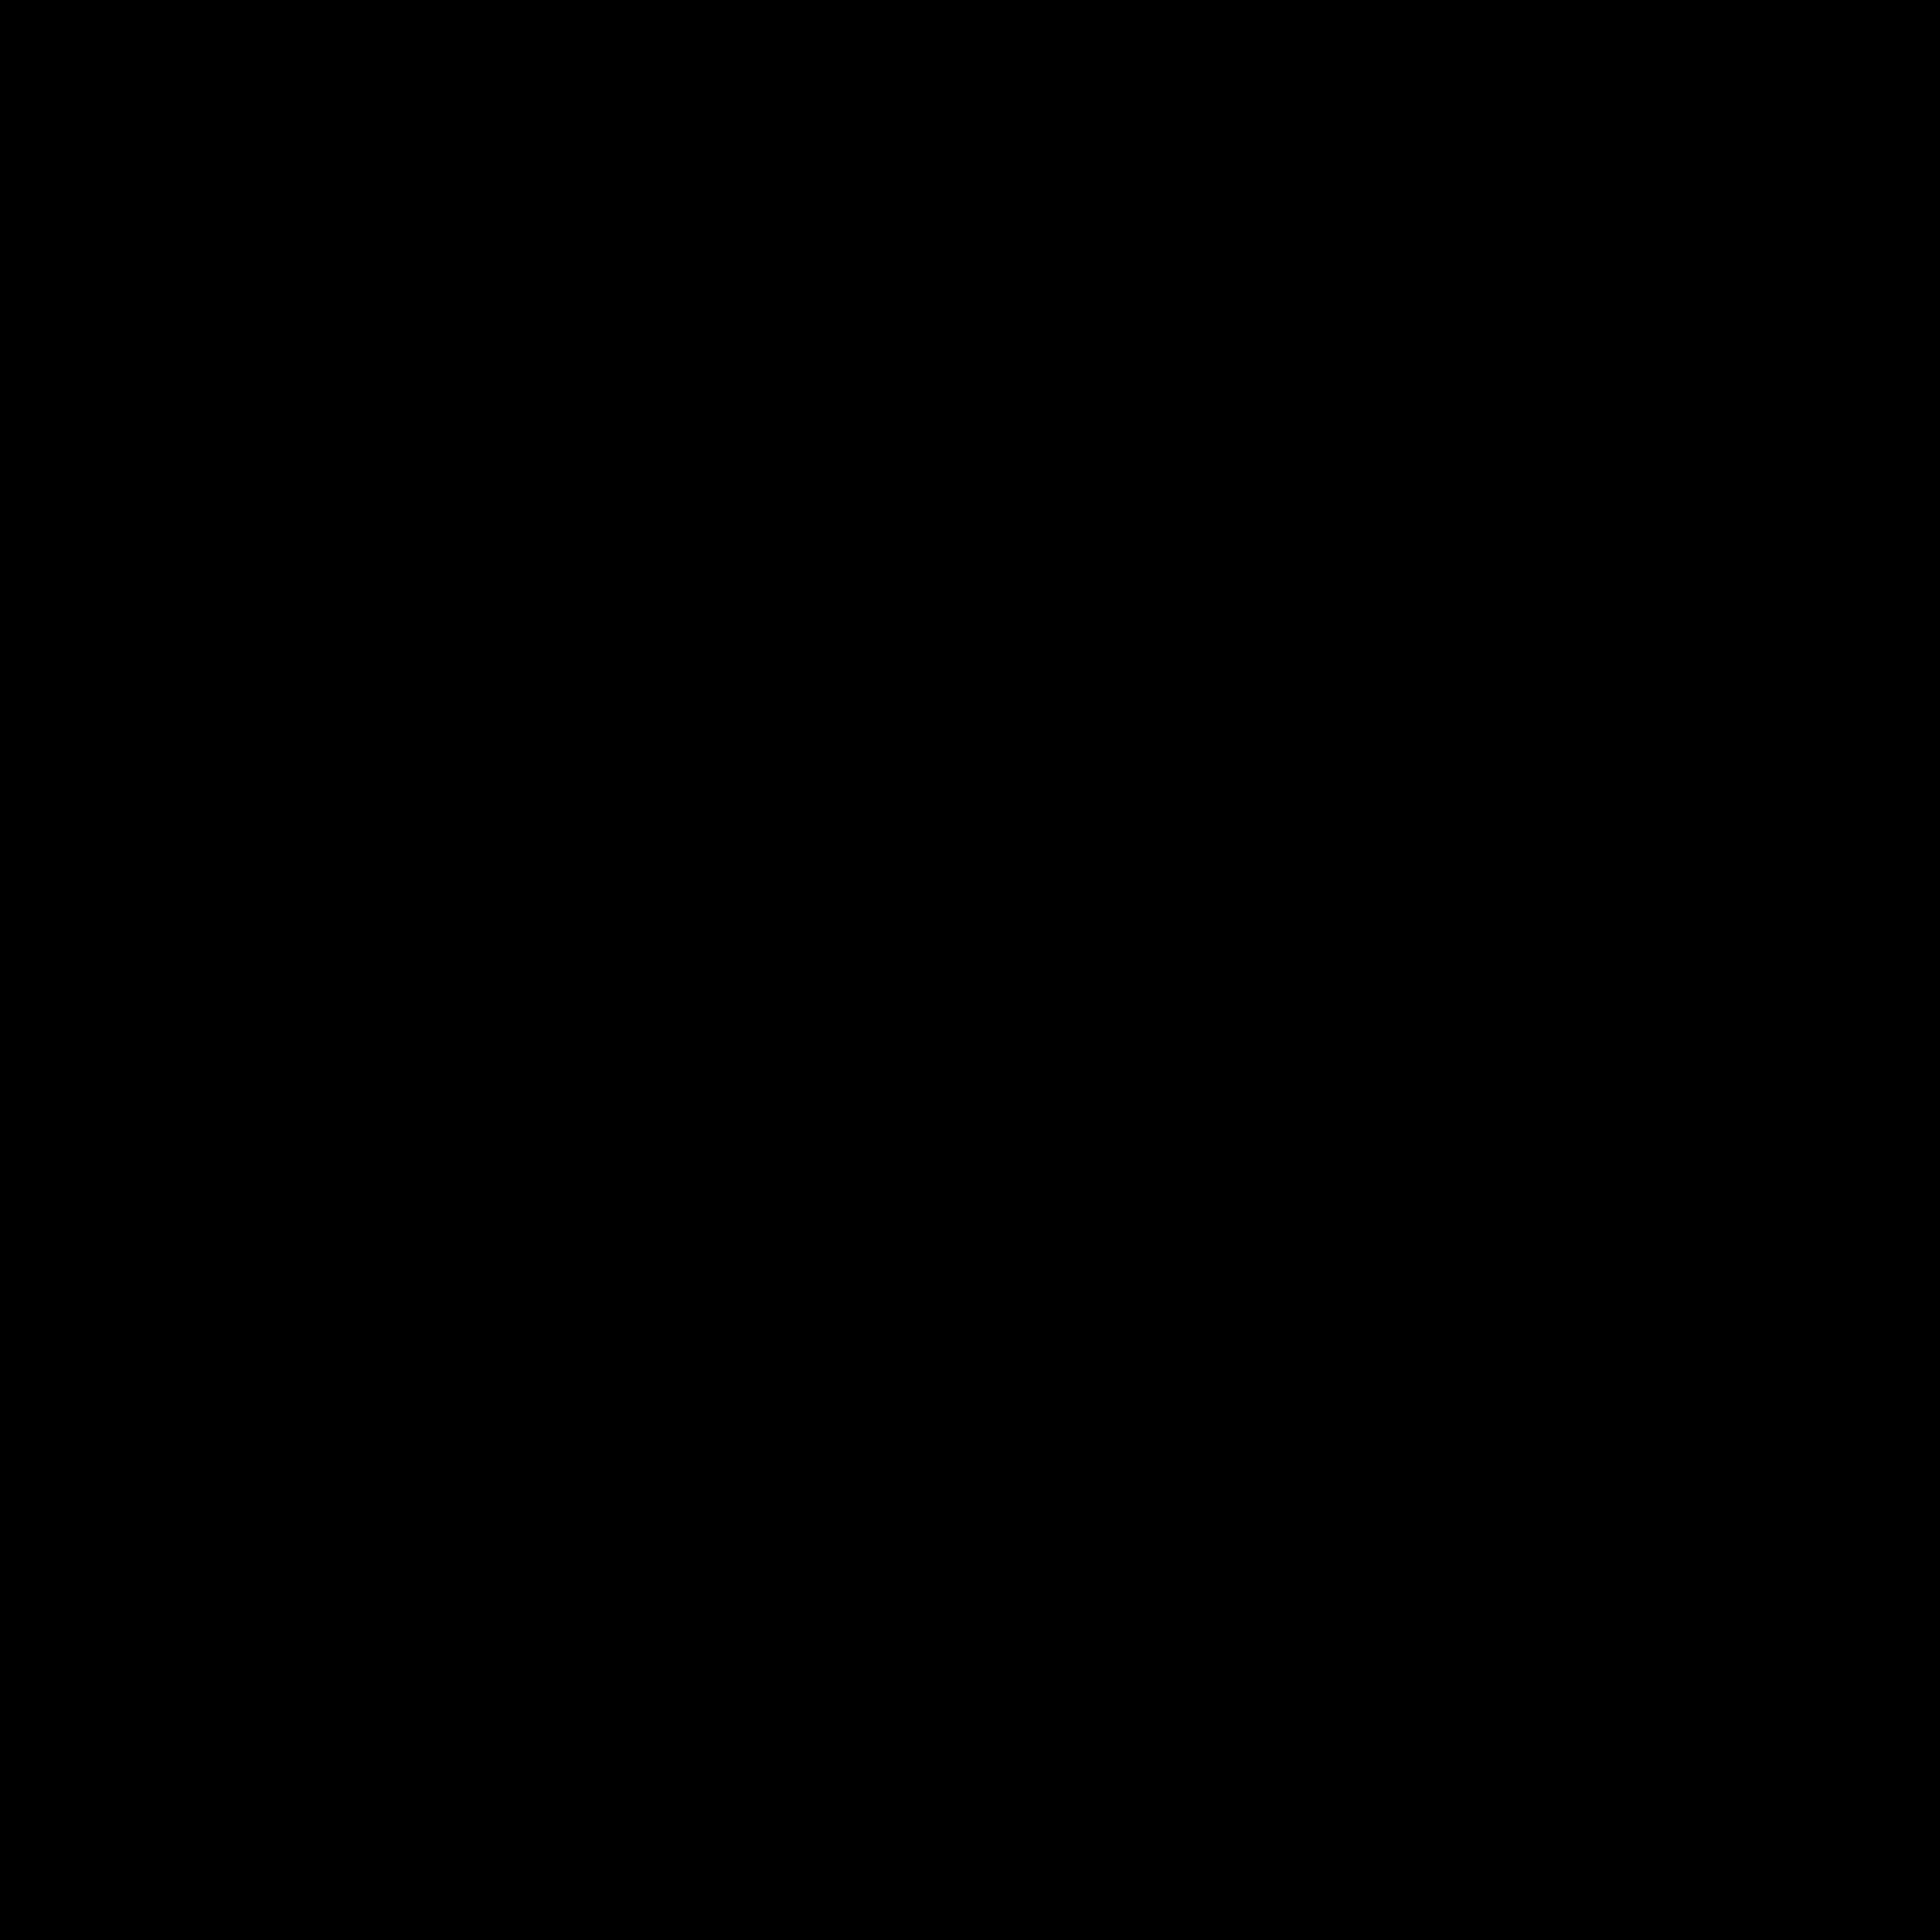 amd-logo-png-transparent.png